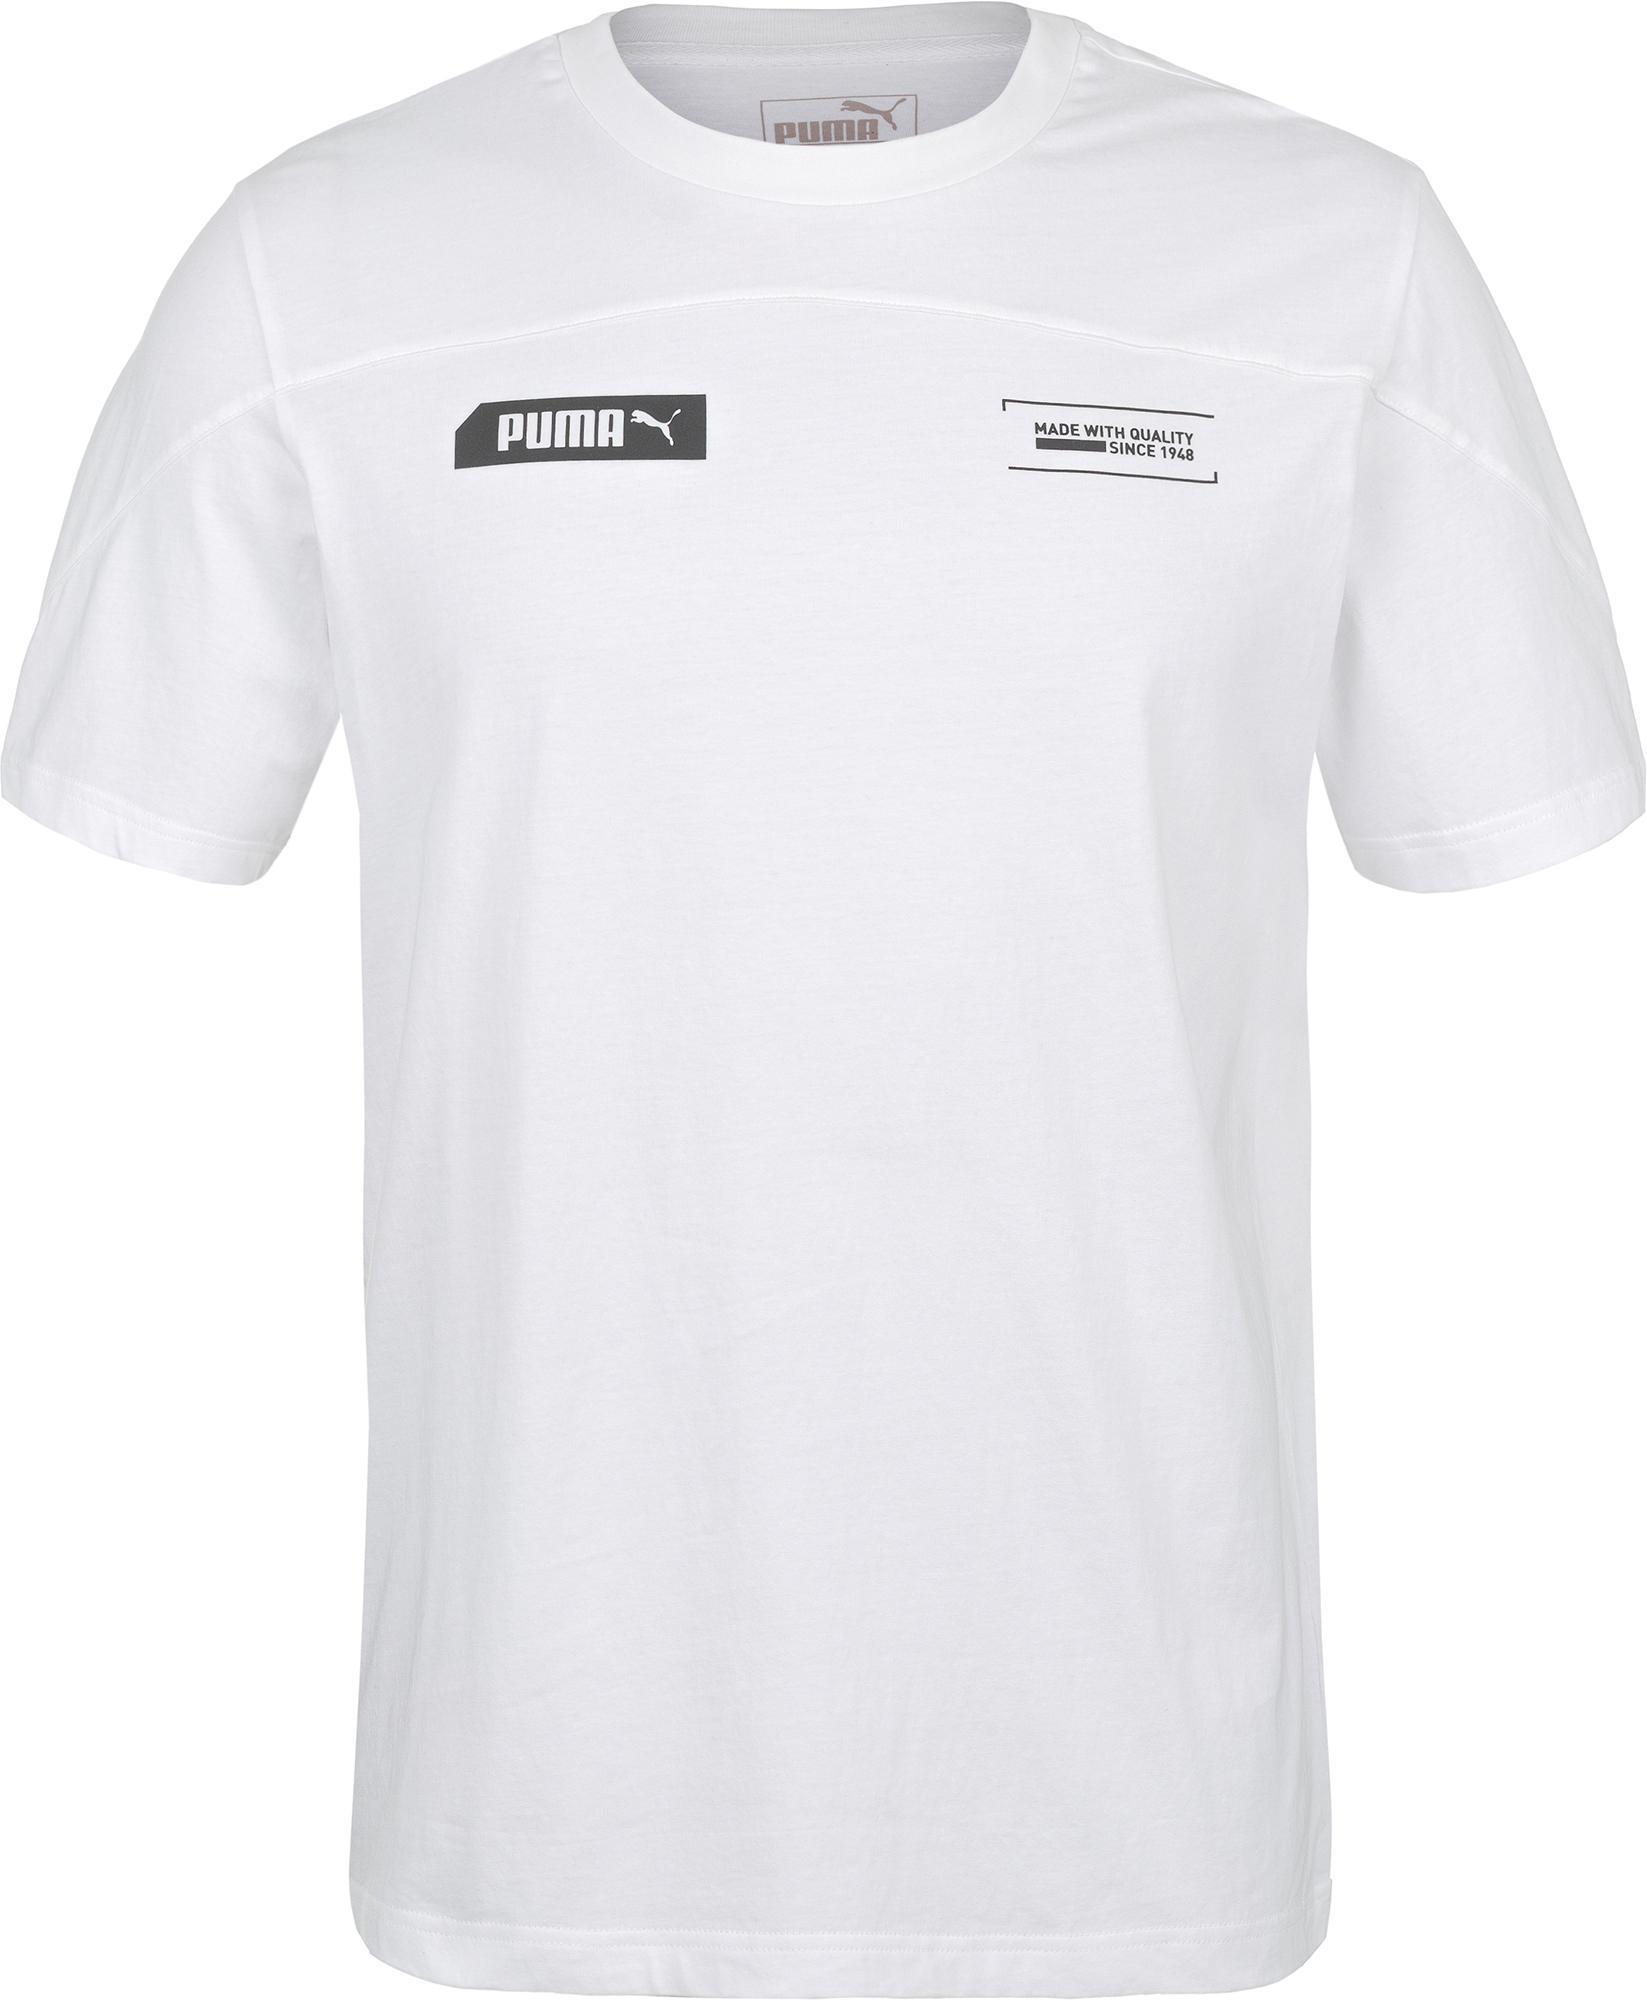 Puma Футболка мужская Puma NU-TILITY Tee, размер 48-50 футболка мужская reebok wor c graphic tee цвет серый ay2245 размер m 48 50